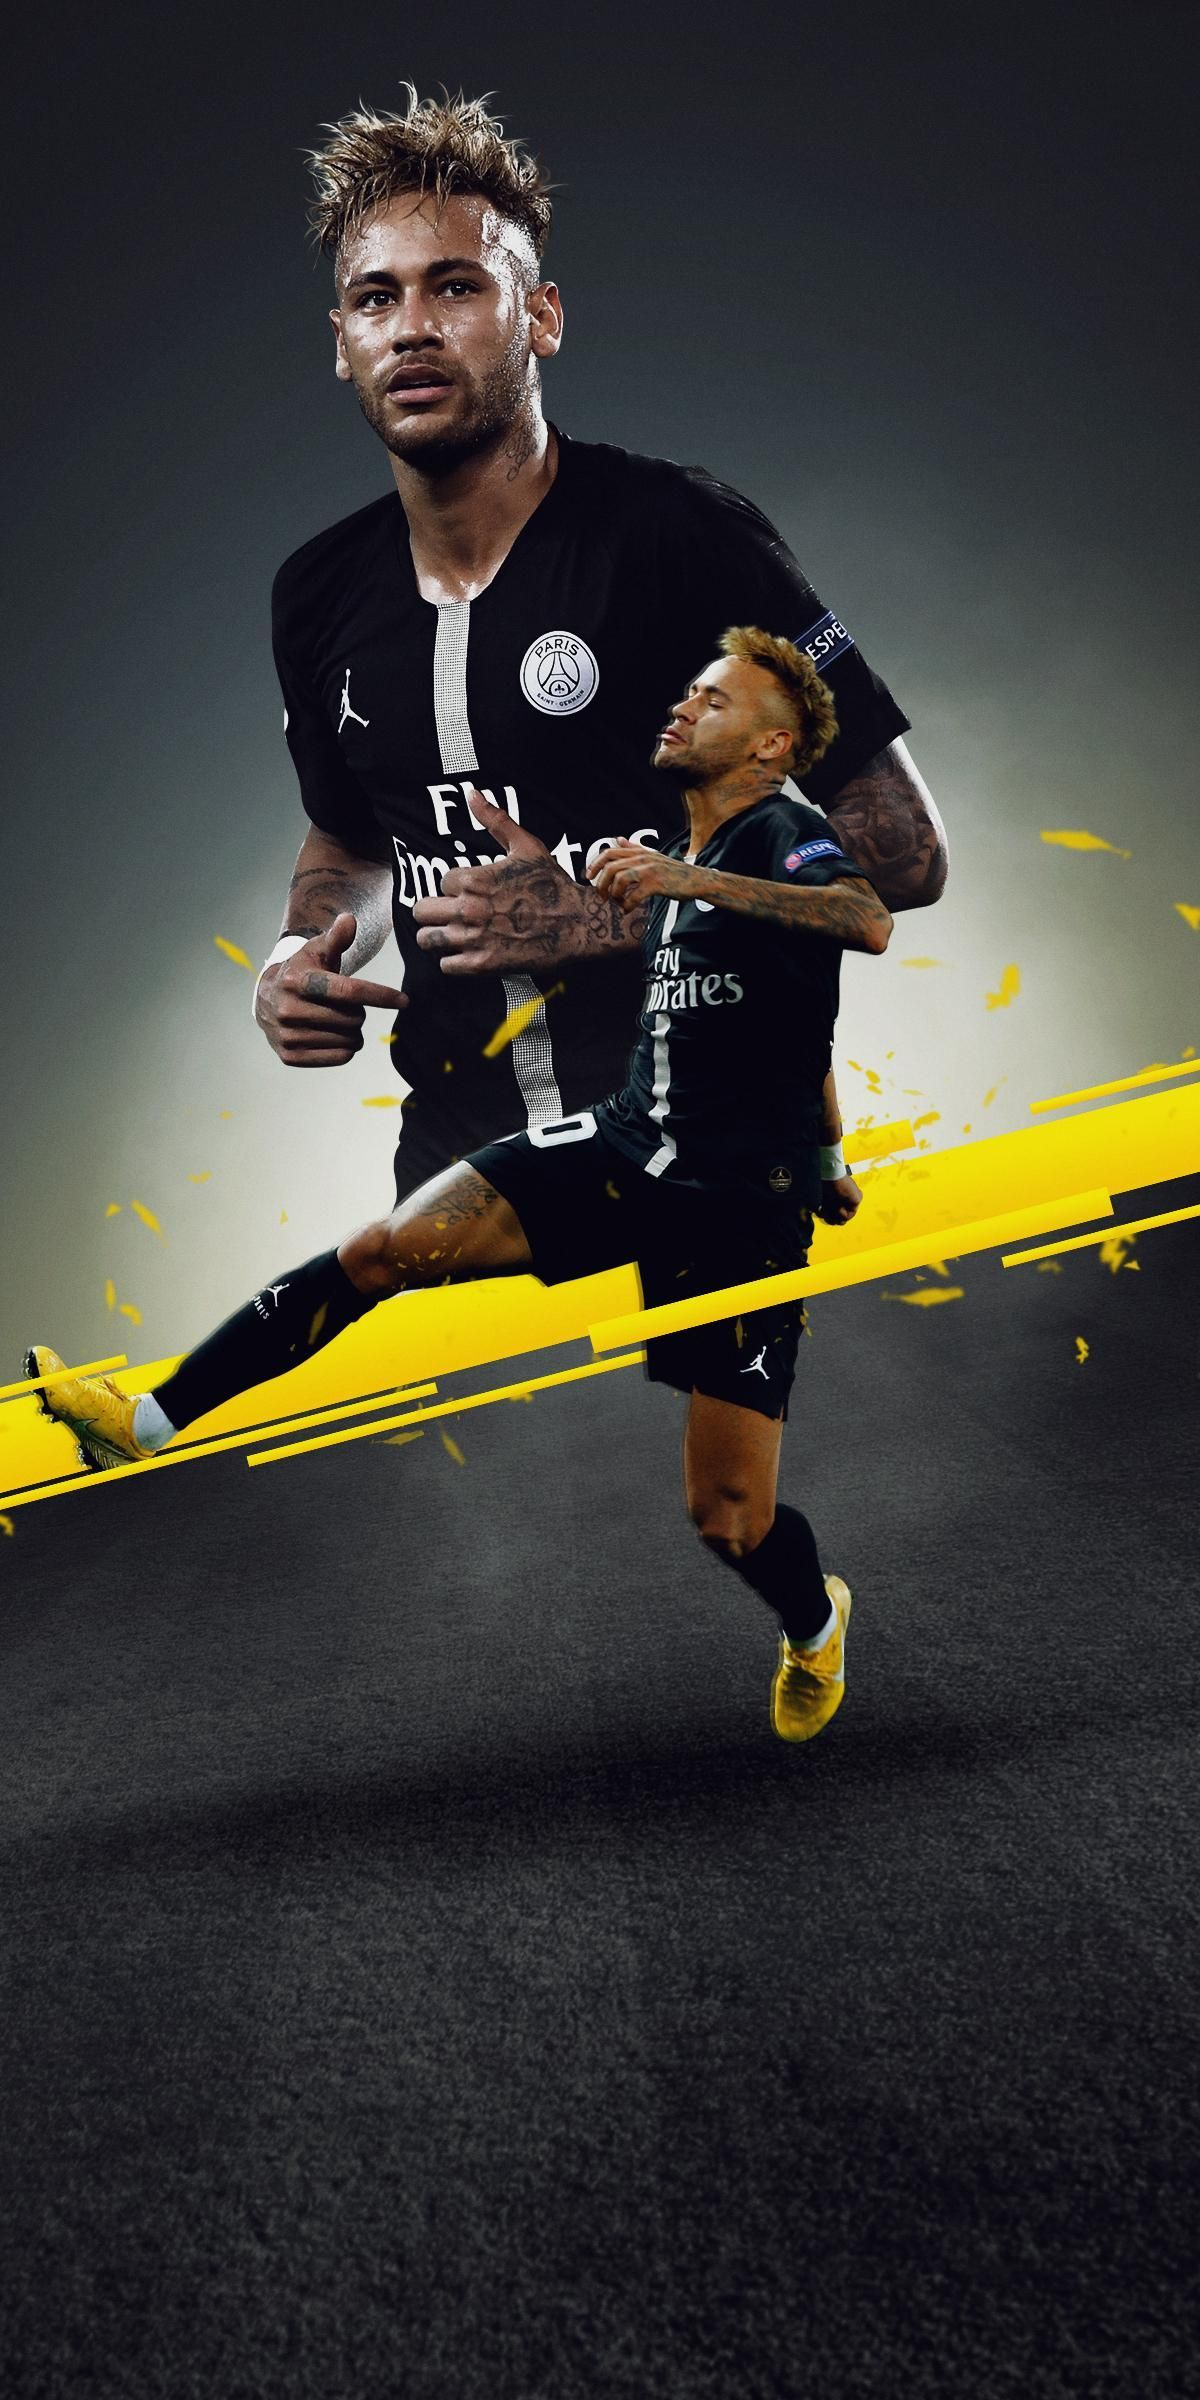 Sports Neymar football, Neymar, Neymar jr wallpapers